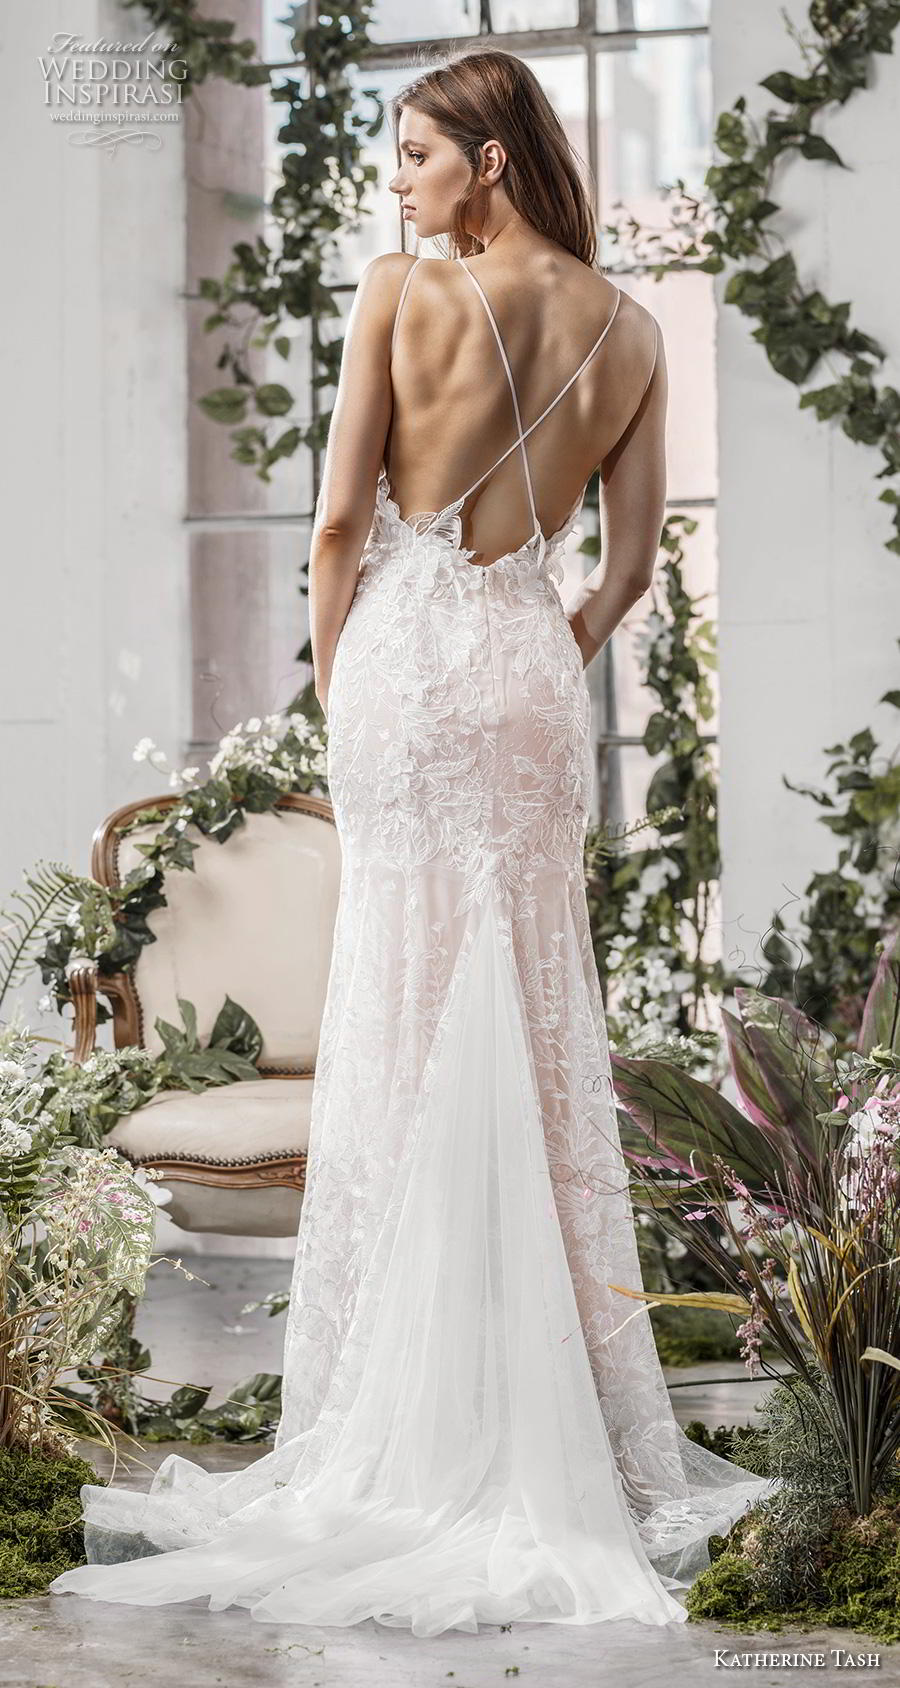 katherine tash fall 2019 bridal thin strap v neck full embellishment romantic blush fit and flare wedding dress cross strap medium train (6) bv